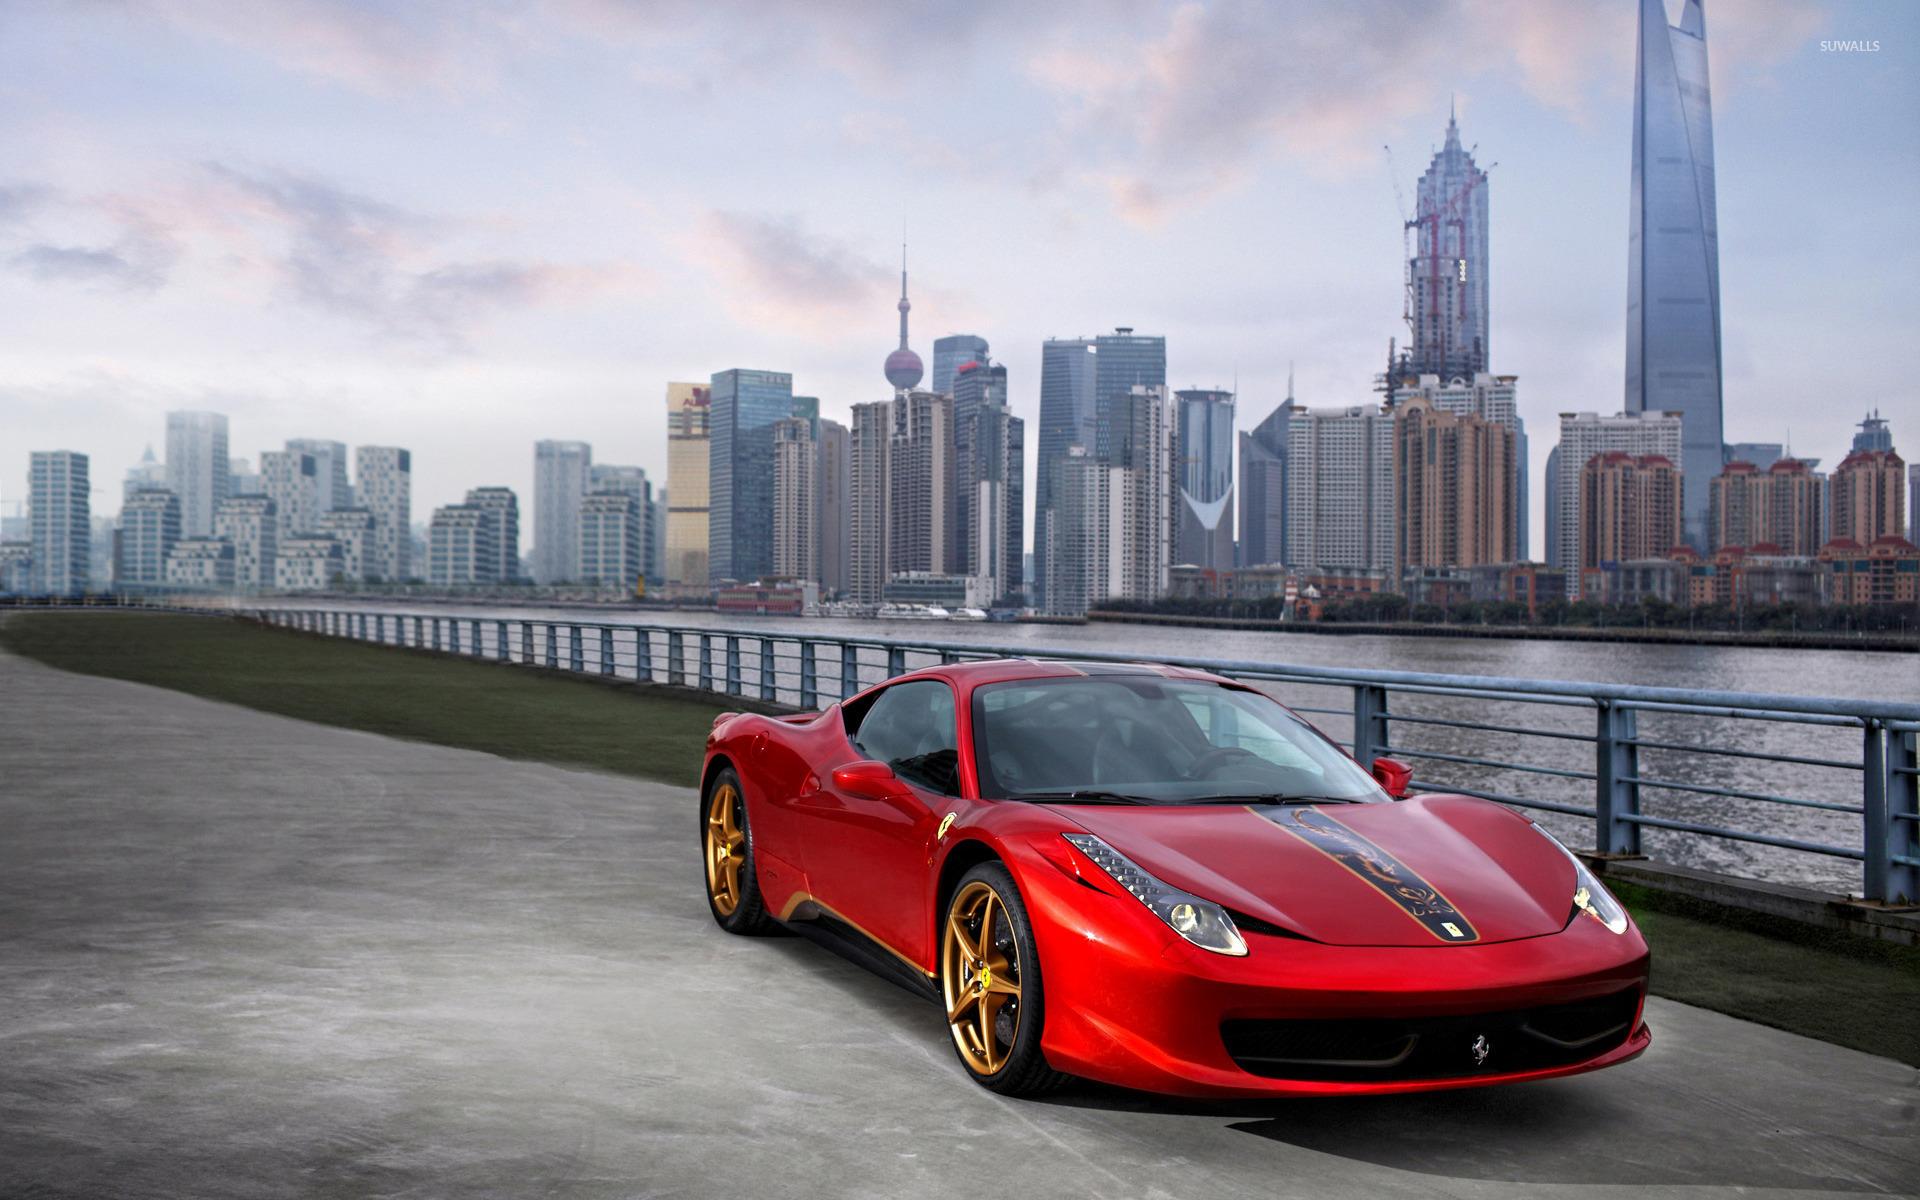 ferrari 458 italia china special edition wallpaper 1920x1200 jpg - Wheelsandmore Ferrari 458 Italia